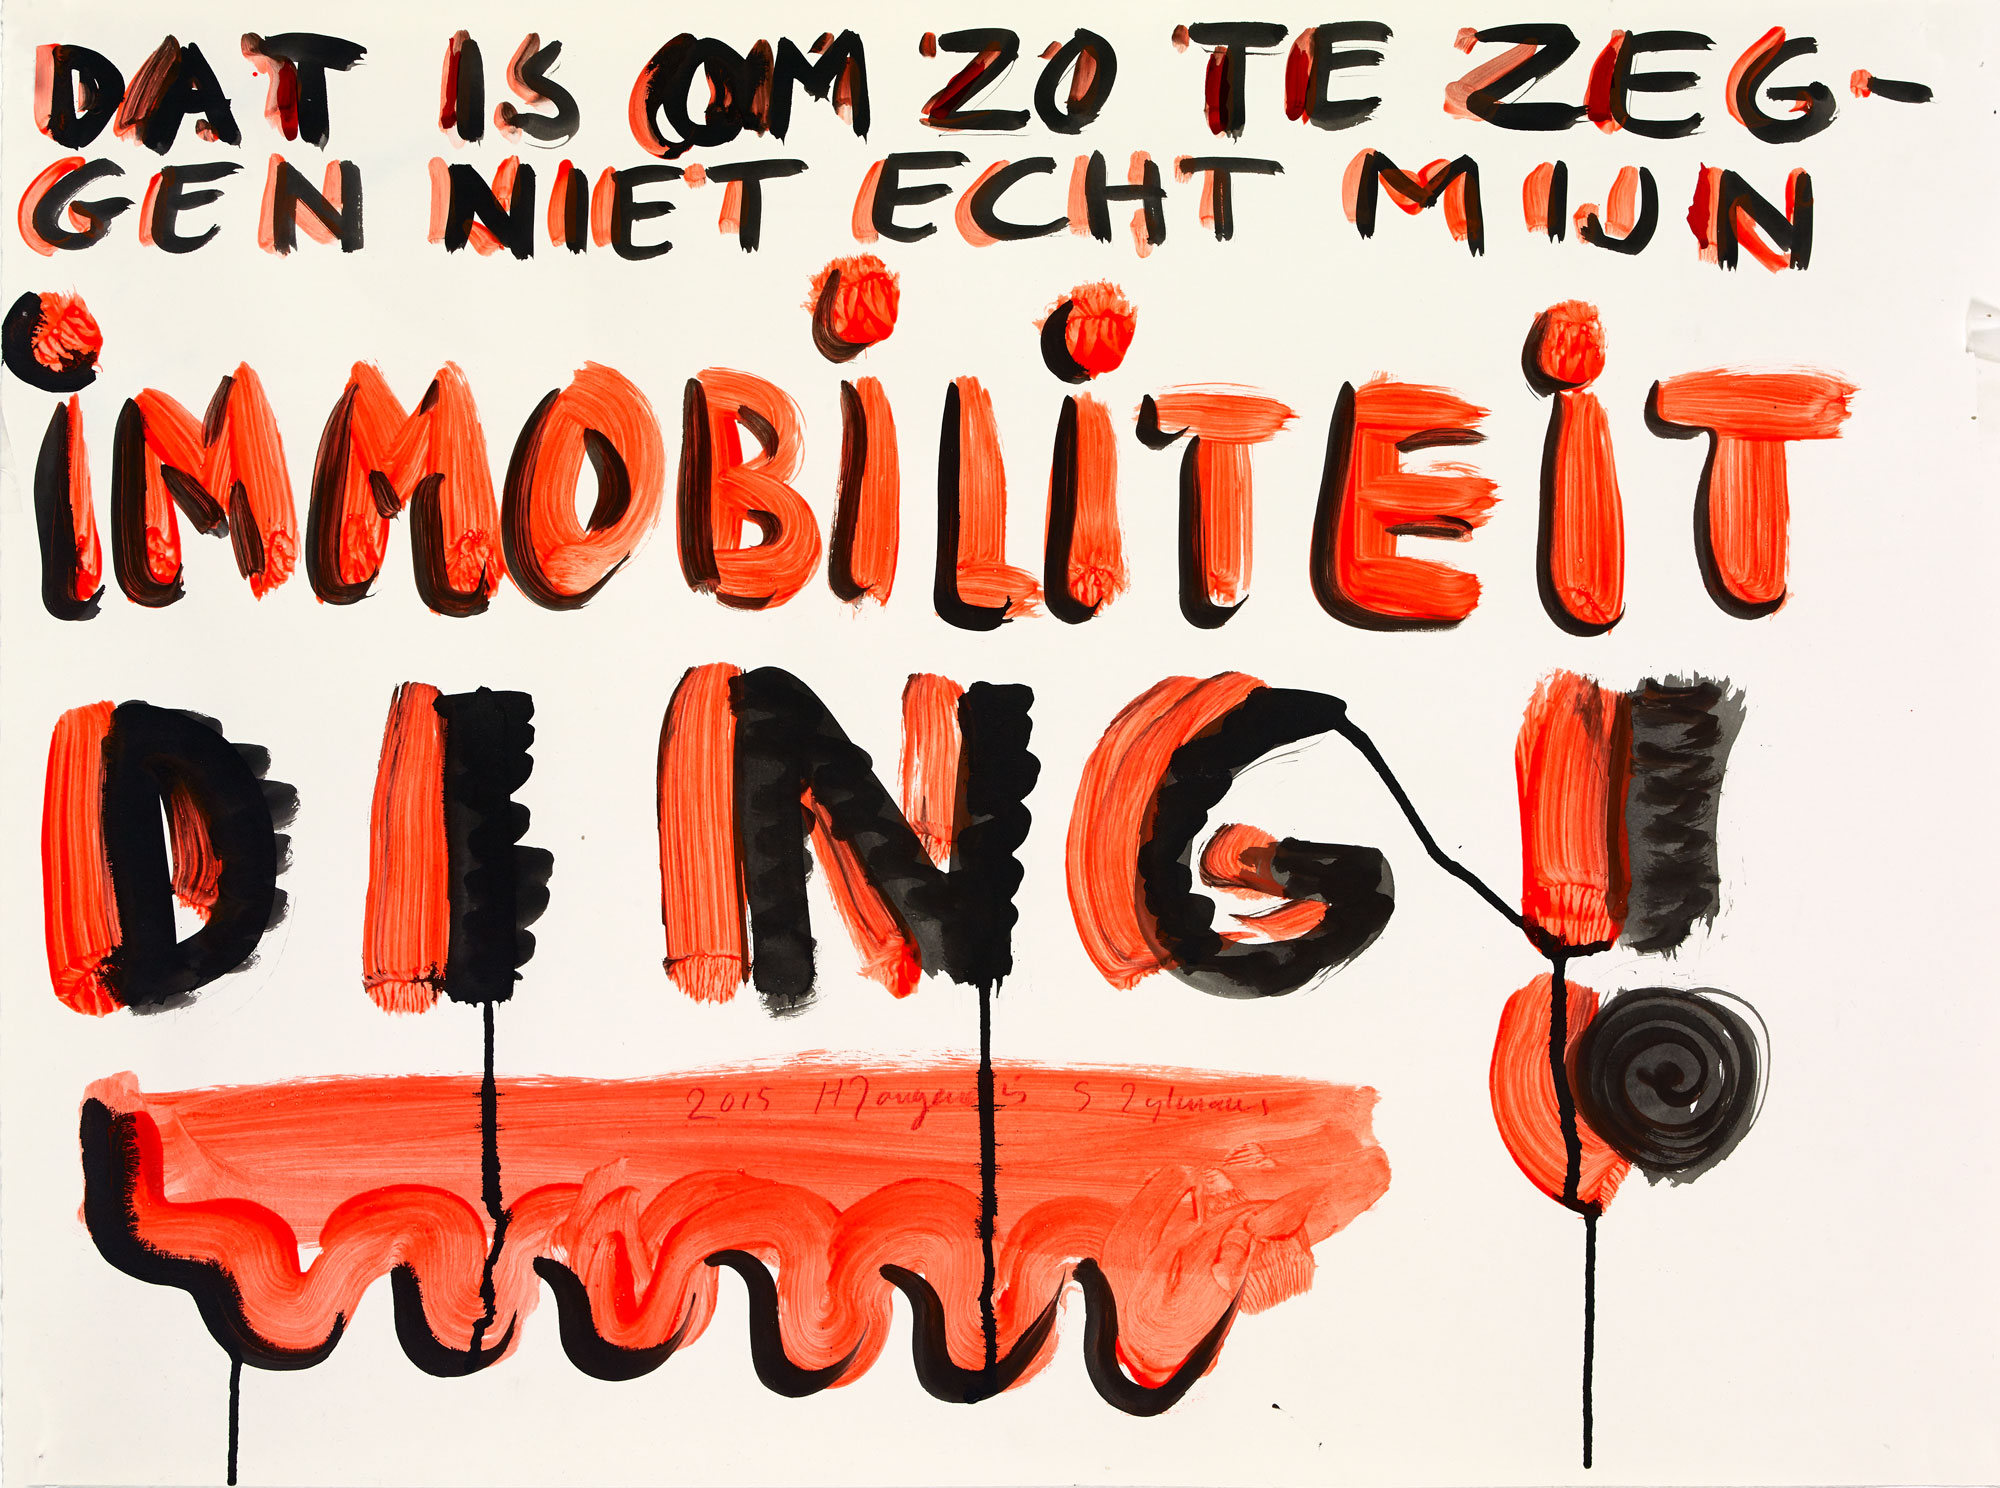 MAGNO_WORKS_16_IMMOBILITEIT-DING